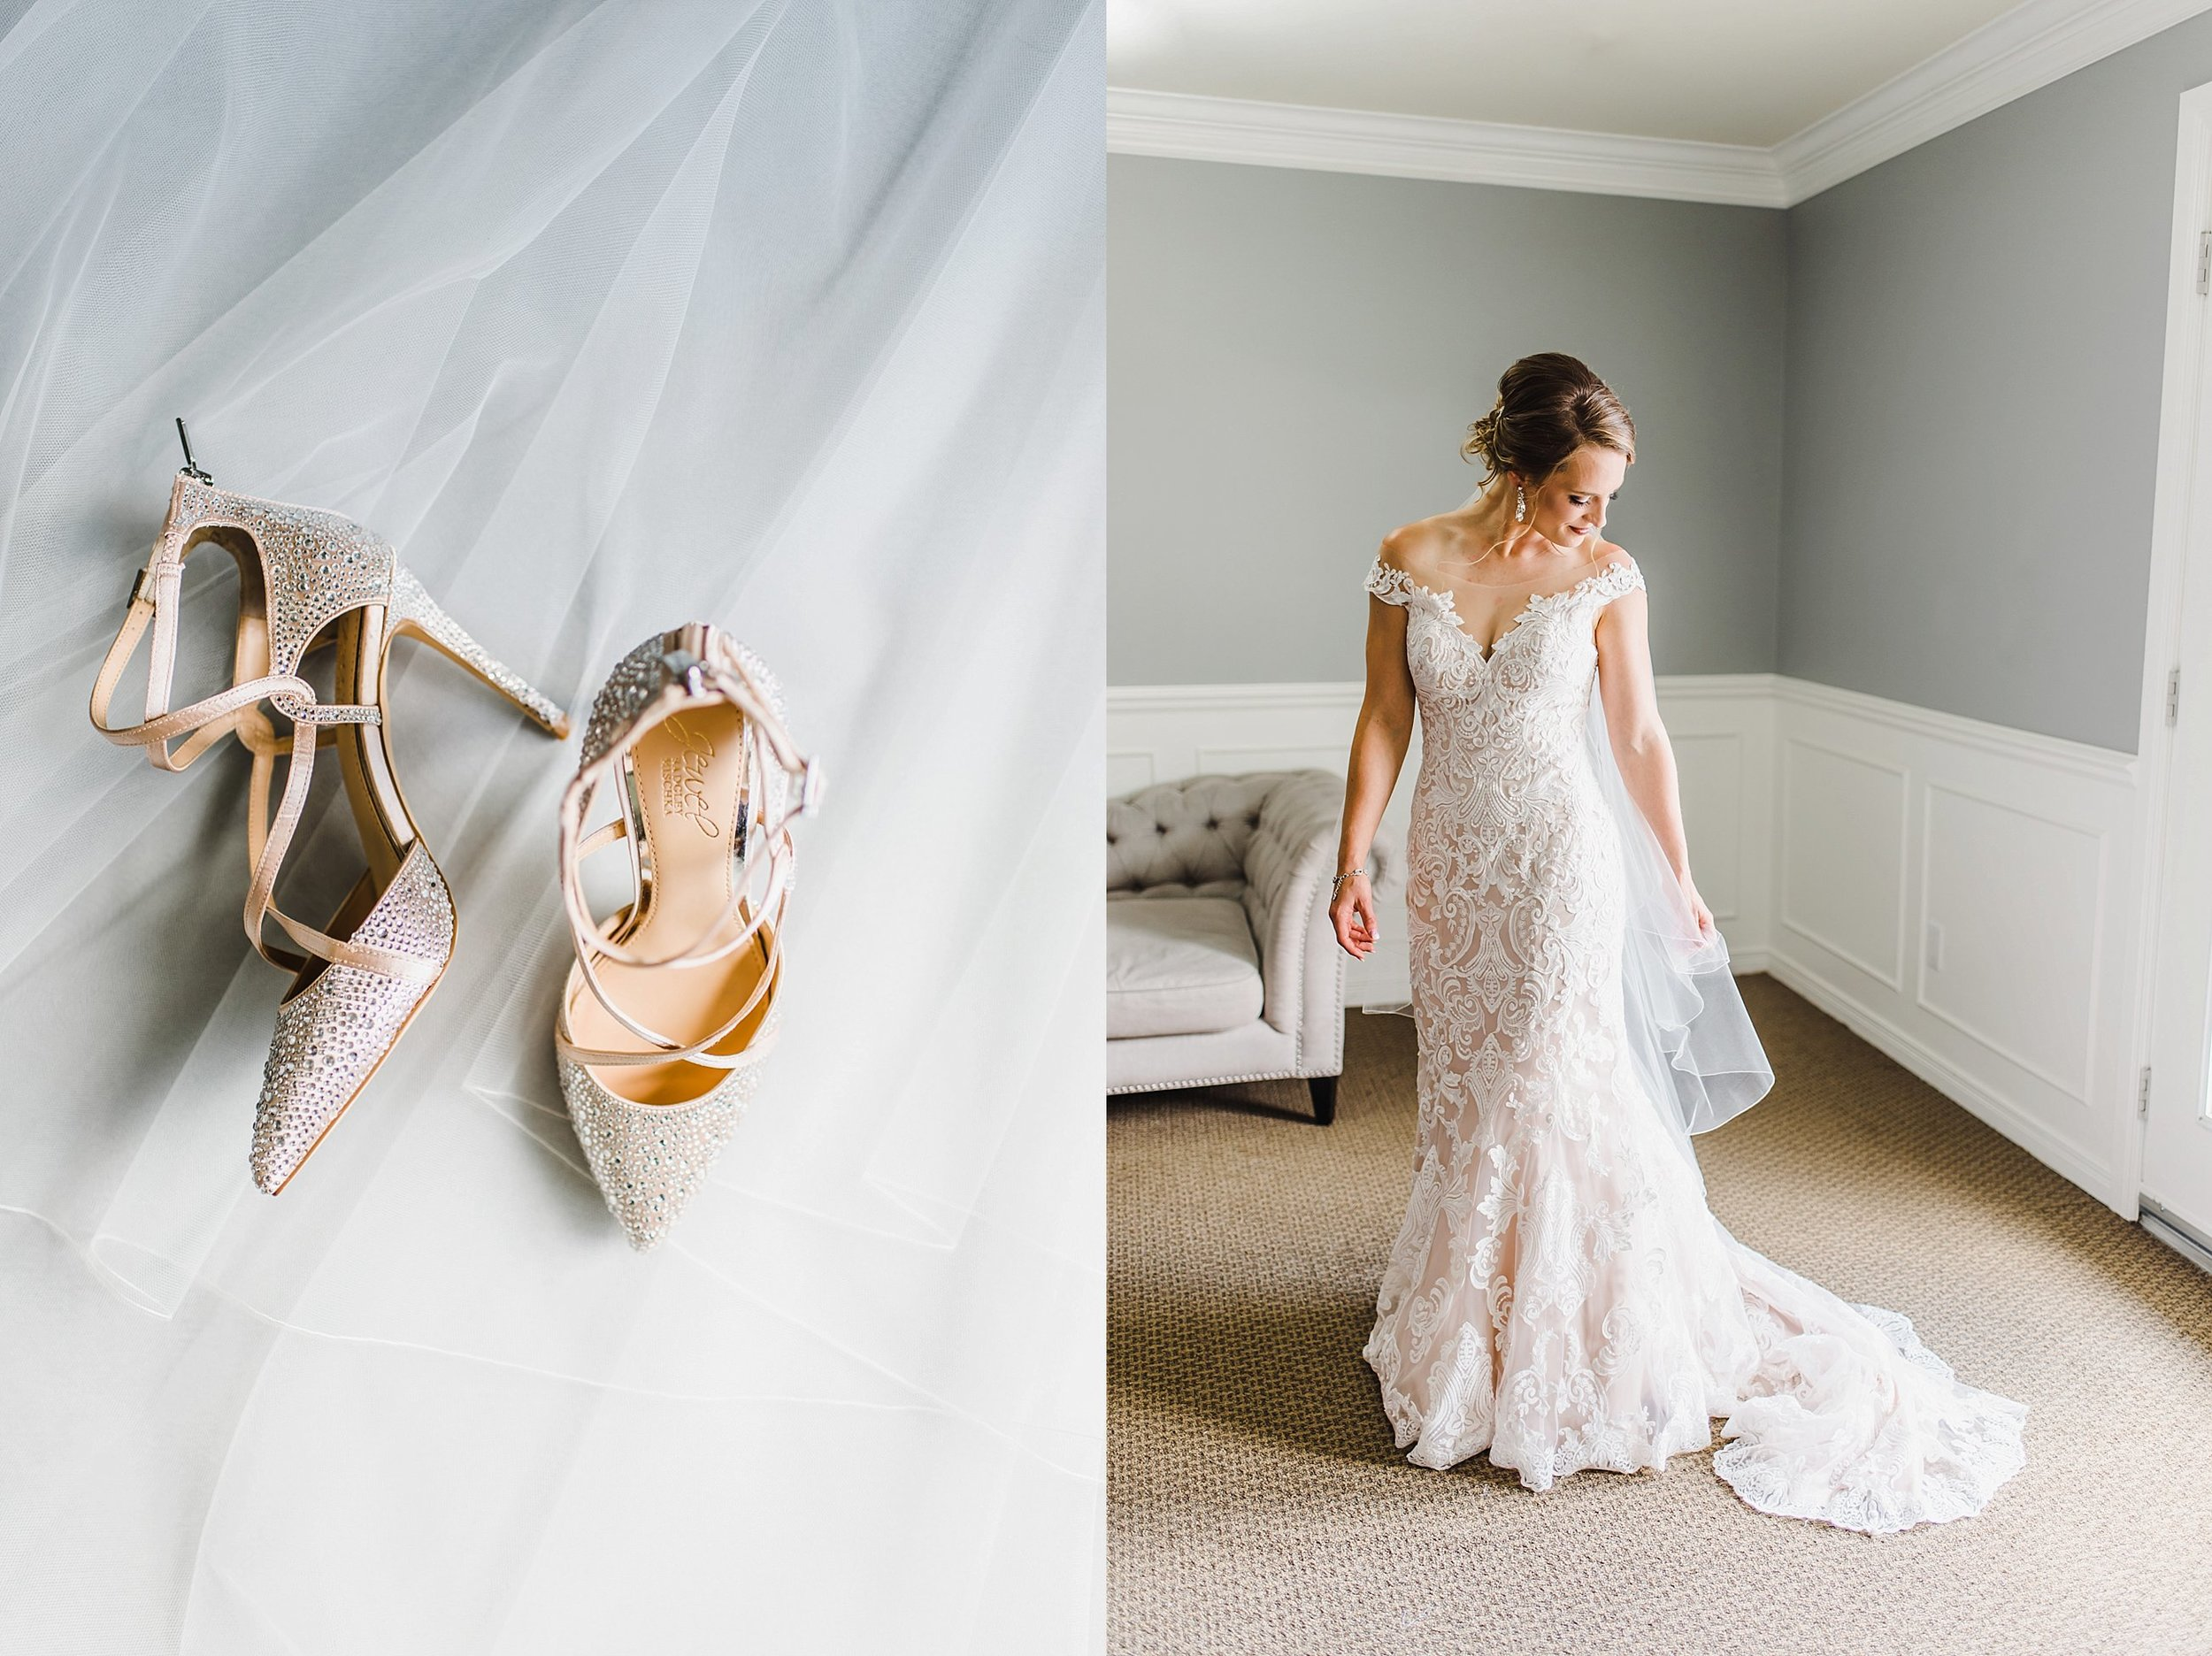 light airy indie fine art ottawa wedding photographer | Ali and Batoul Photography_1231.jpg